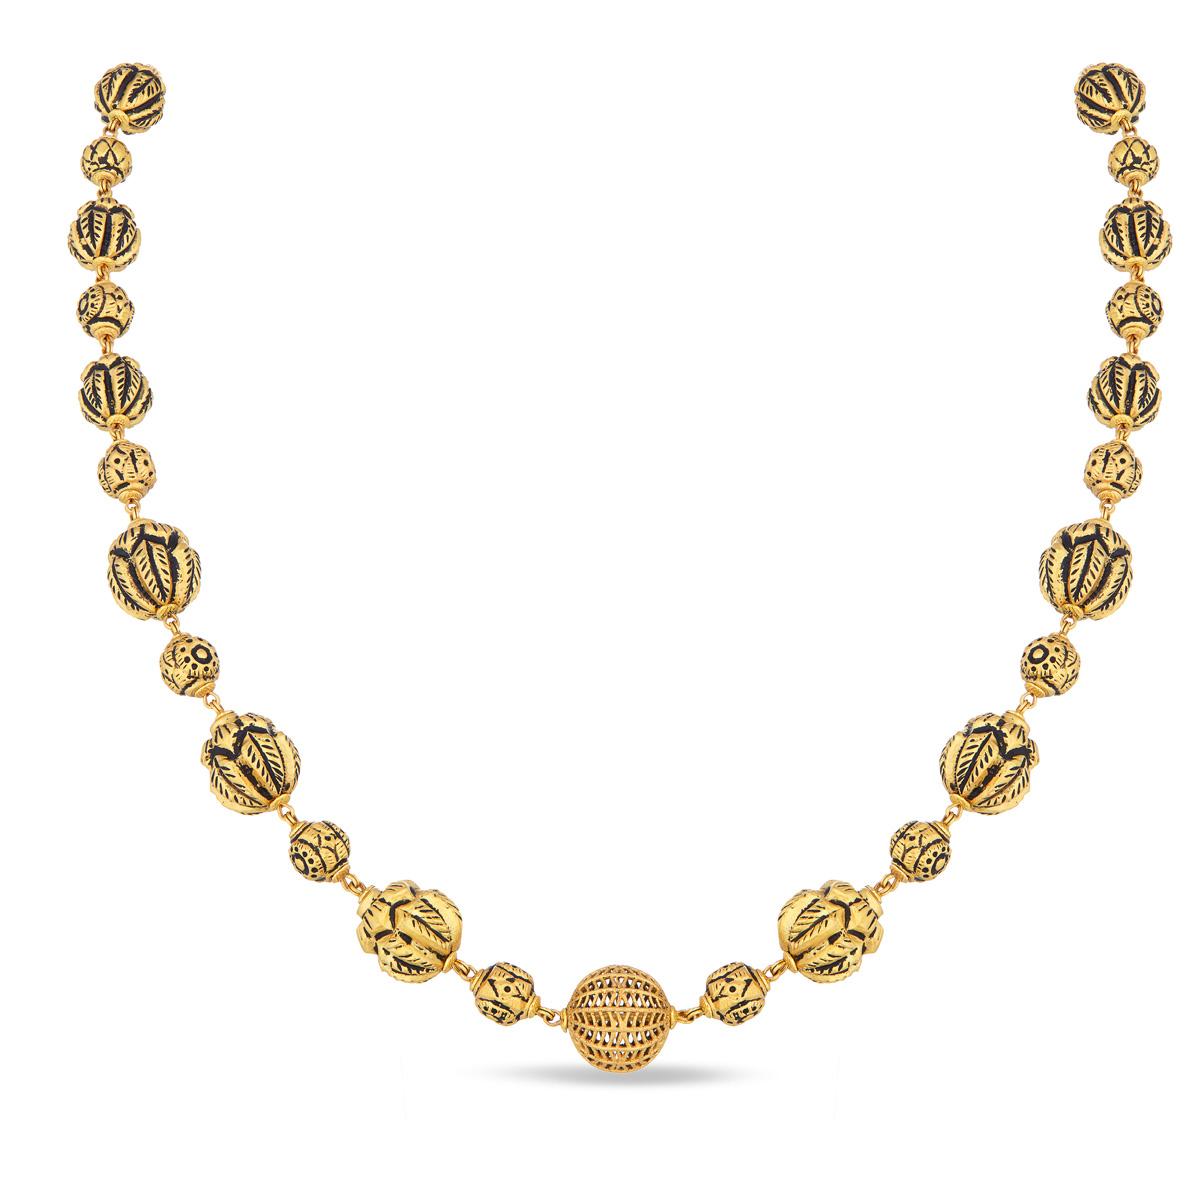 Designed Gold Balls Chain